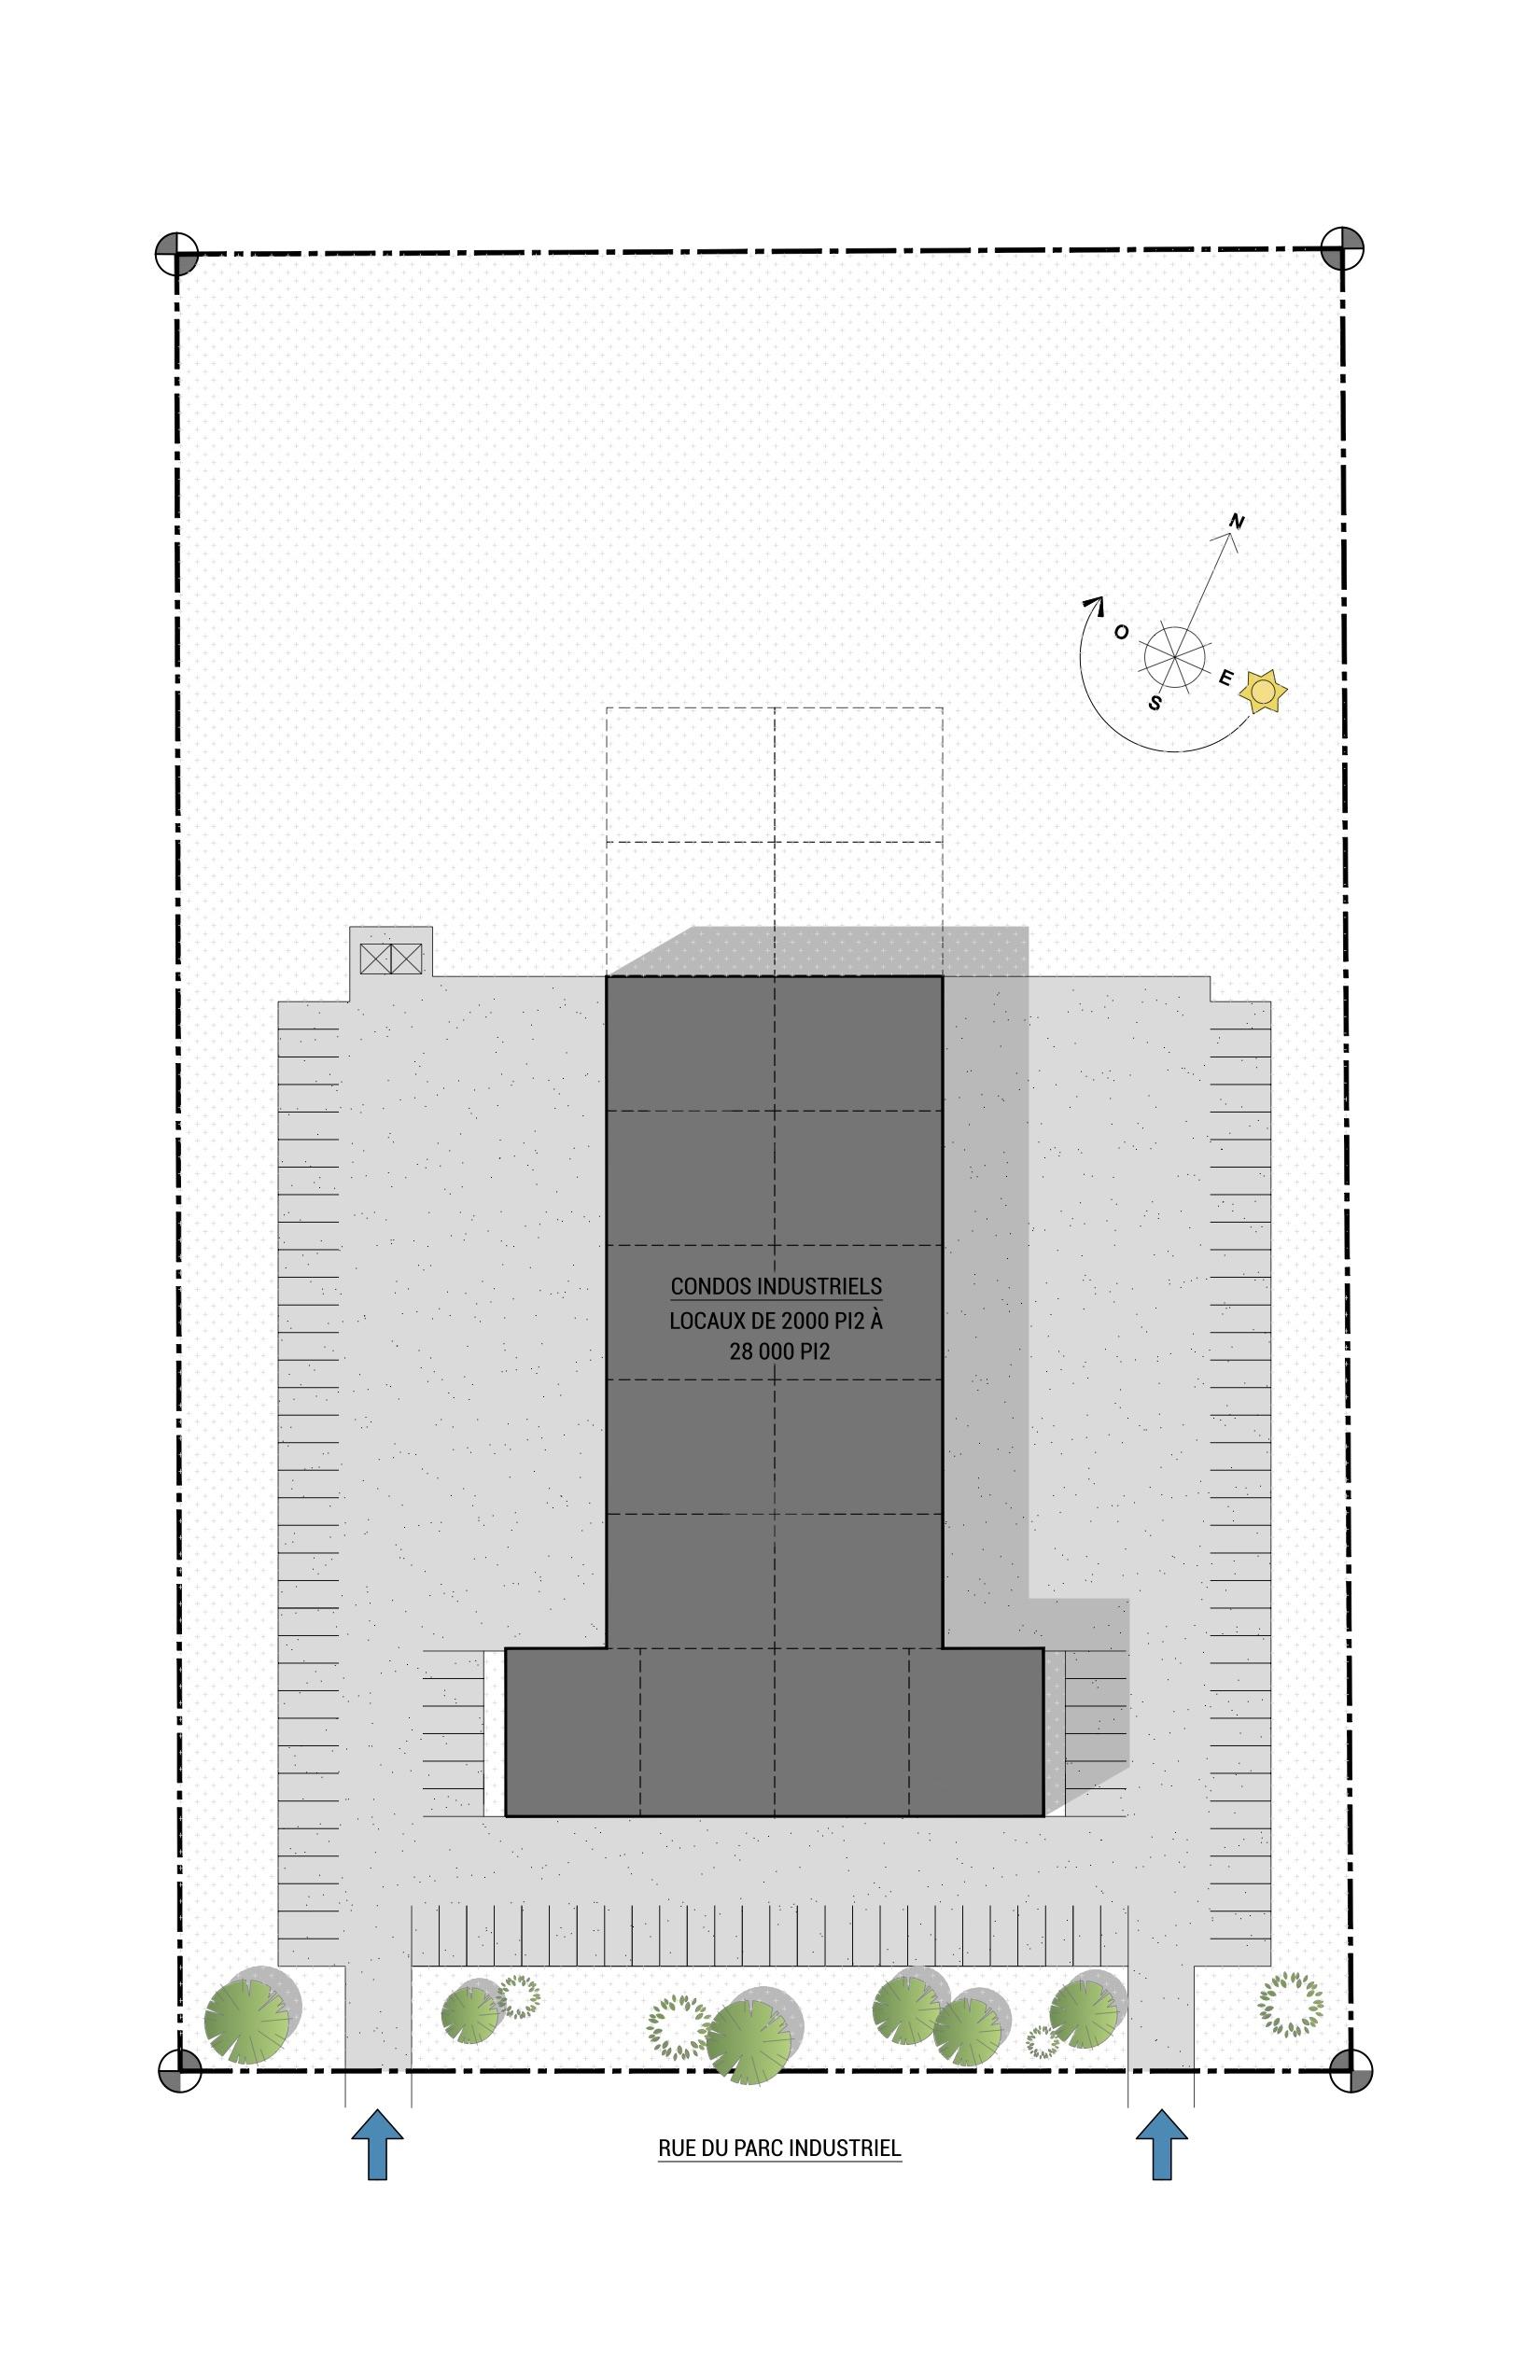 2017-01-28 Implantation pour vente (41-01)